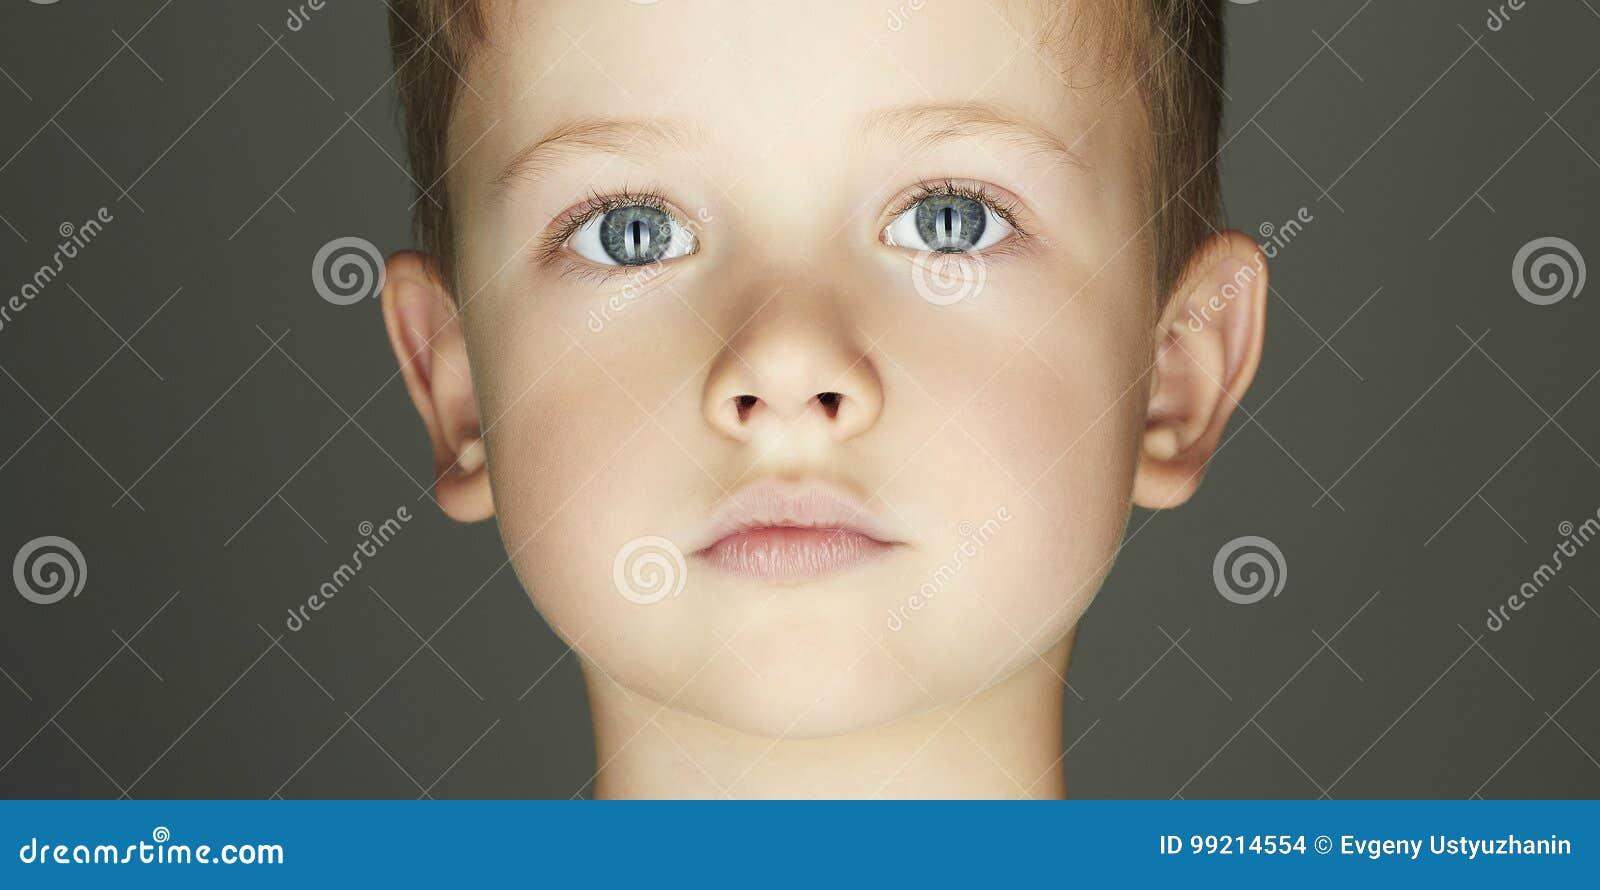 Child boy face